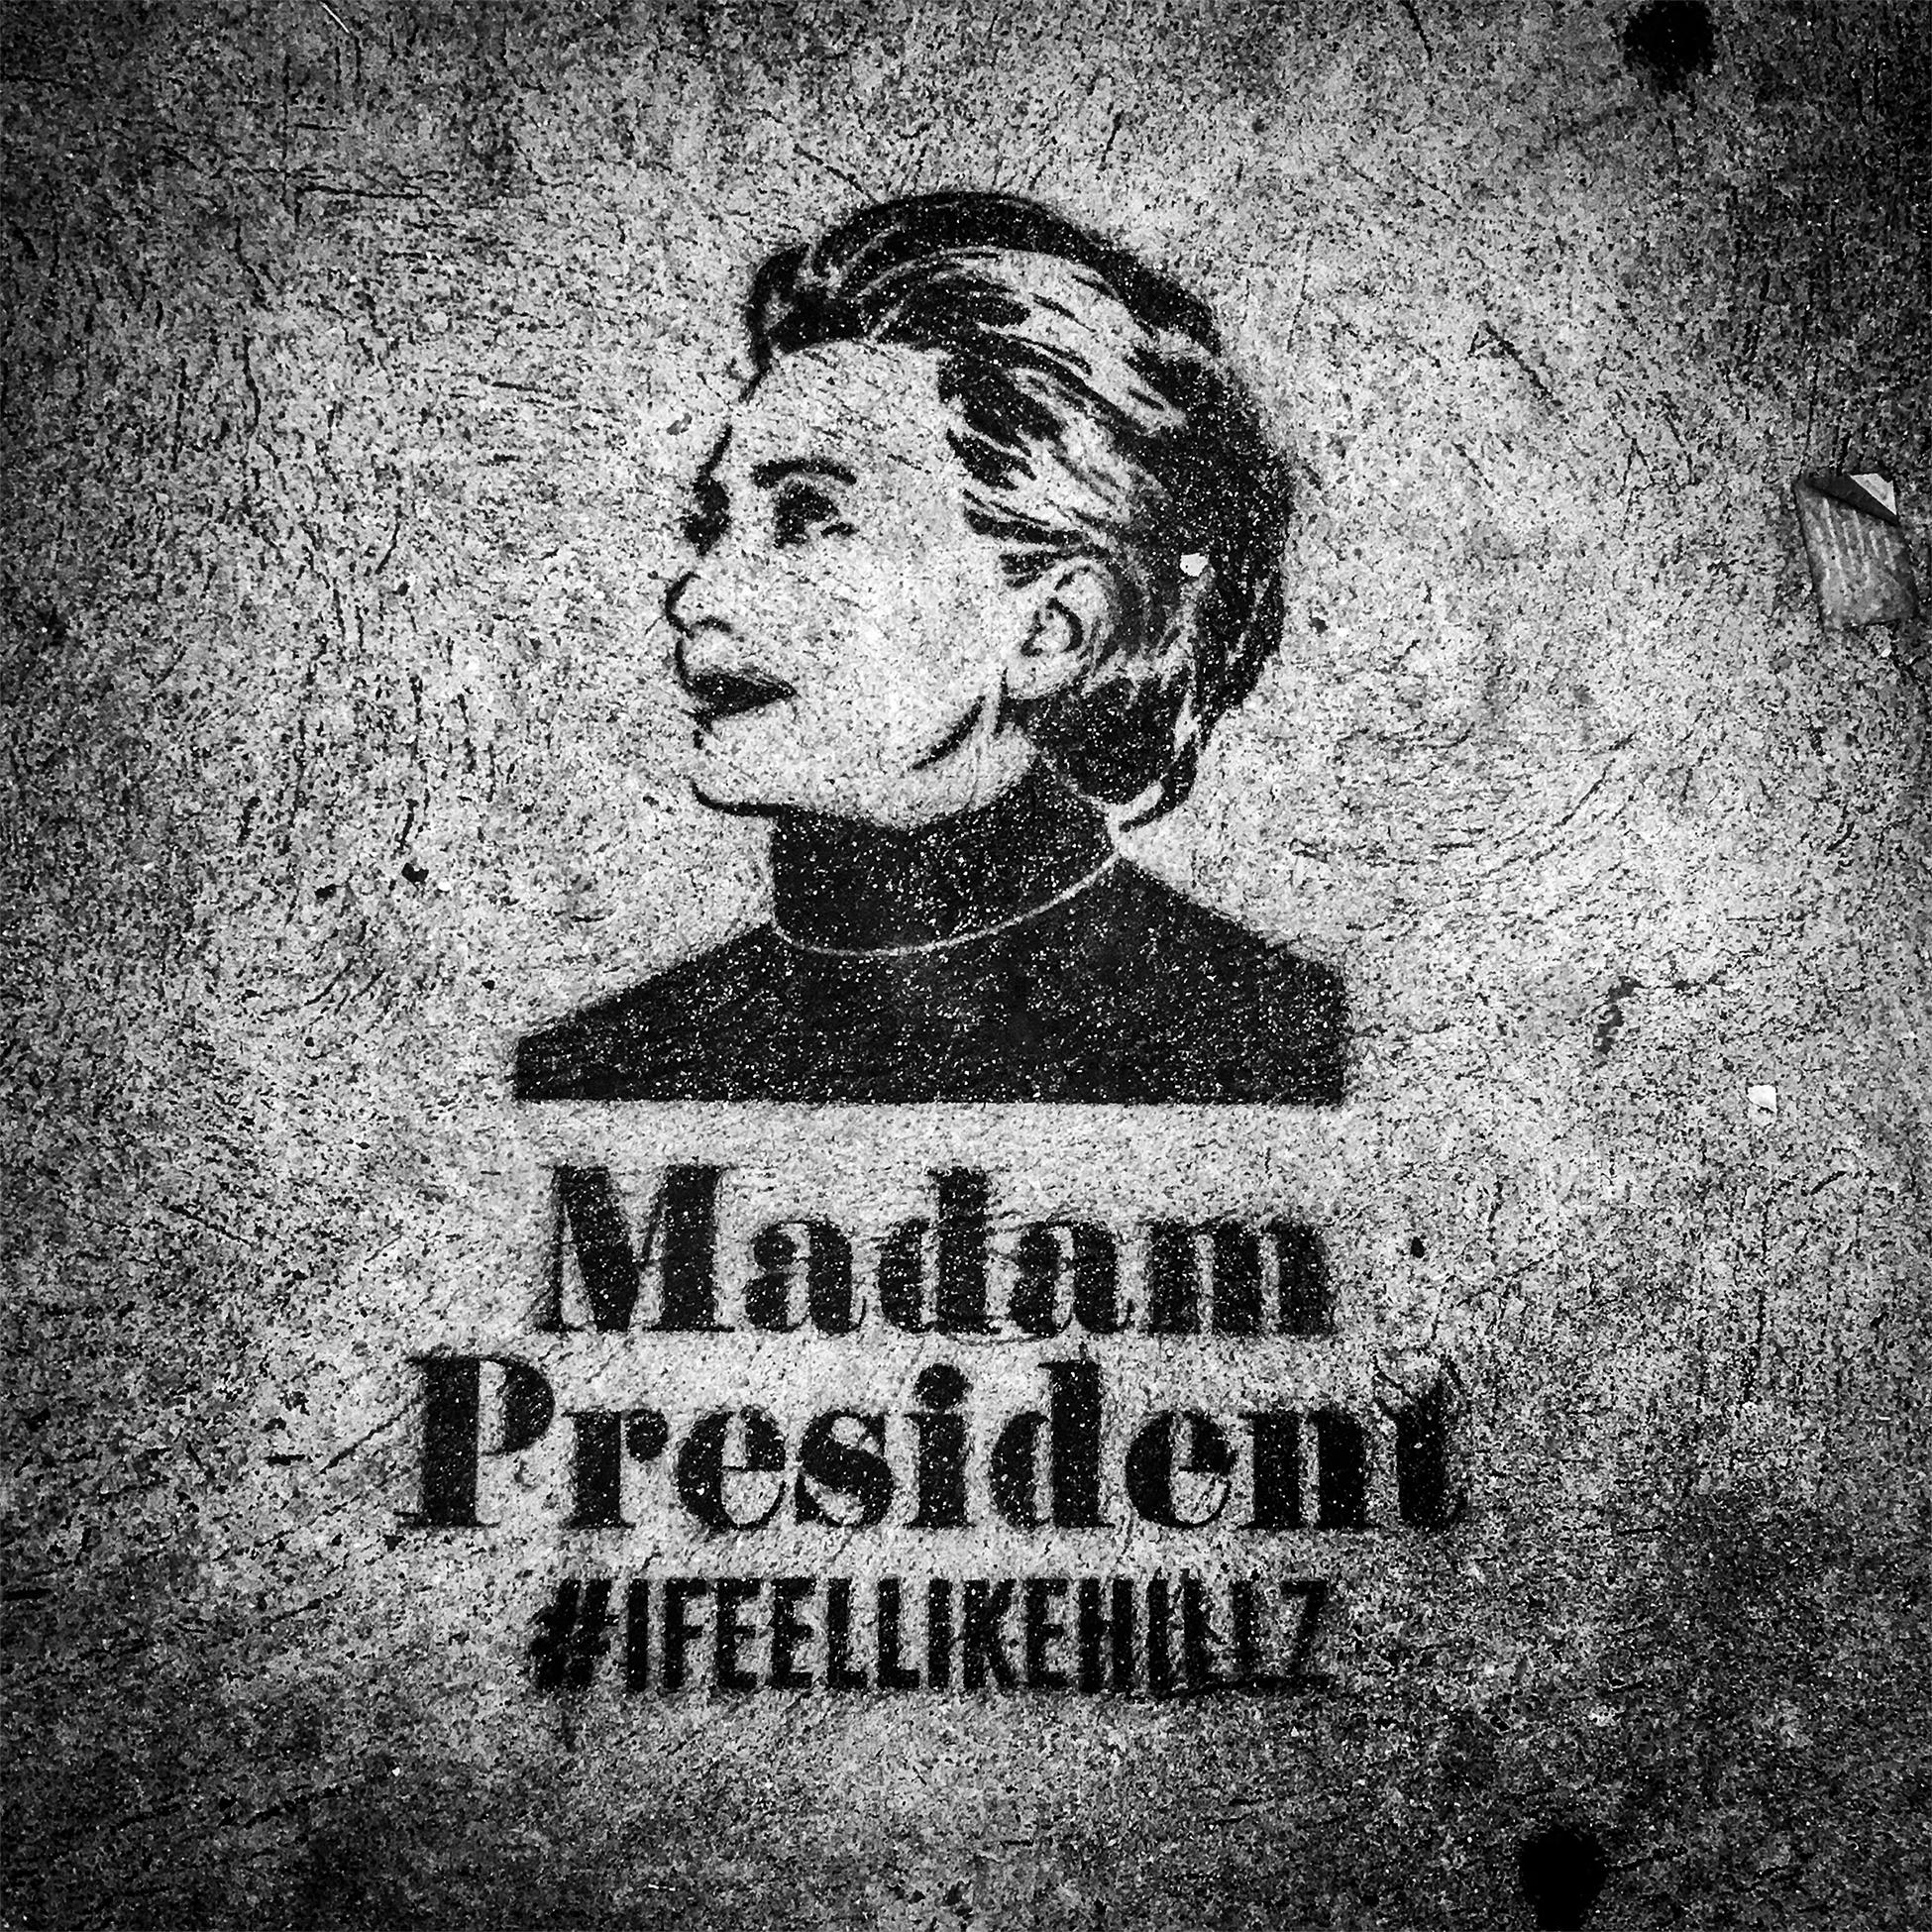 Sidewalk Art, 34th Street, 2016